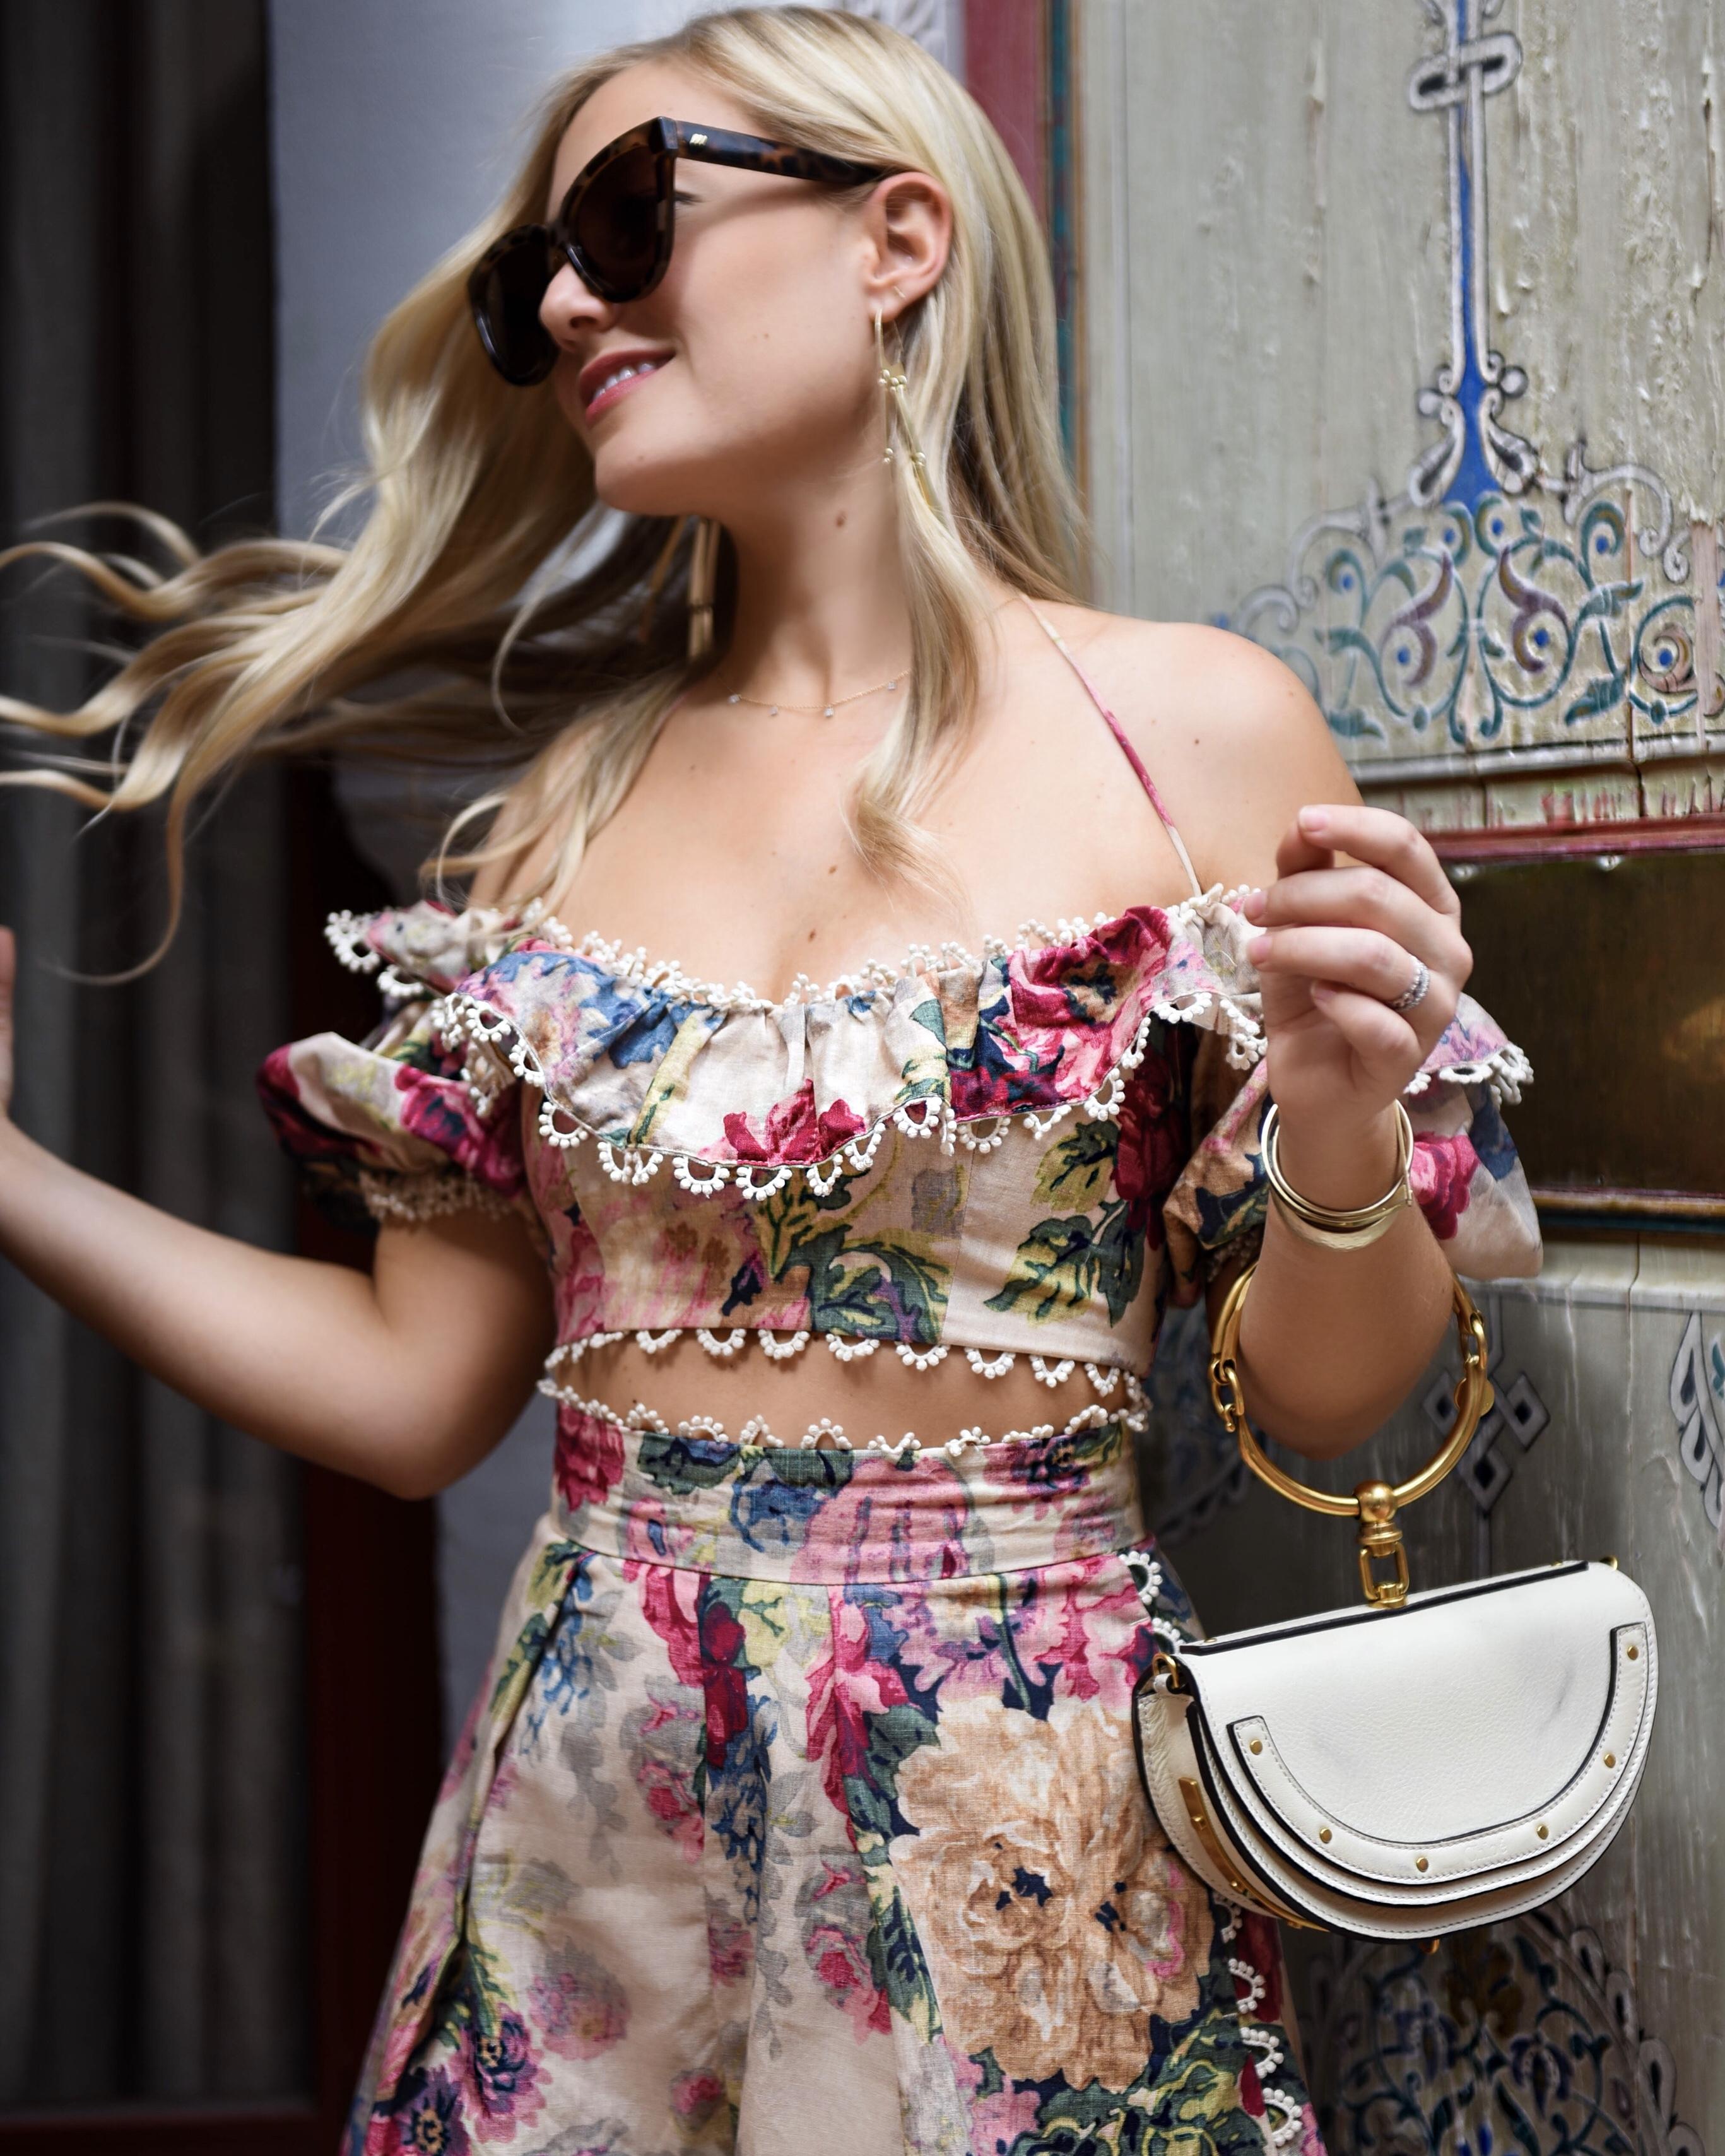 37fb16801adf1d Blonde-Woman-Wearing-Zimmermann-Melody-Off-Shoulder-Crop-Top-Melody -High-Waist-Shorts-Chloe-Handbag-Matching-Set-Lo-Murphy-Travel-Blogger